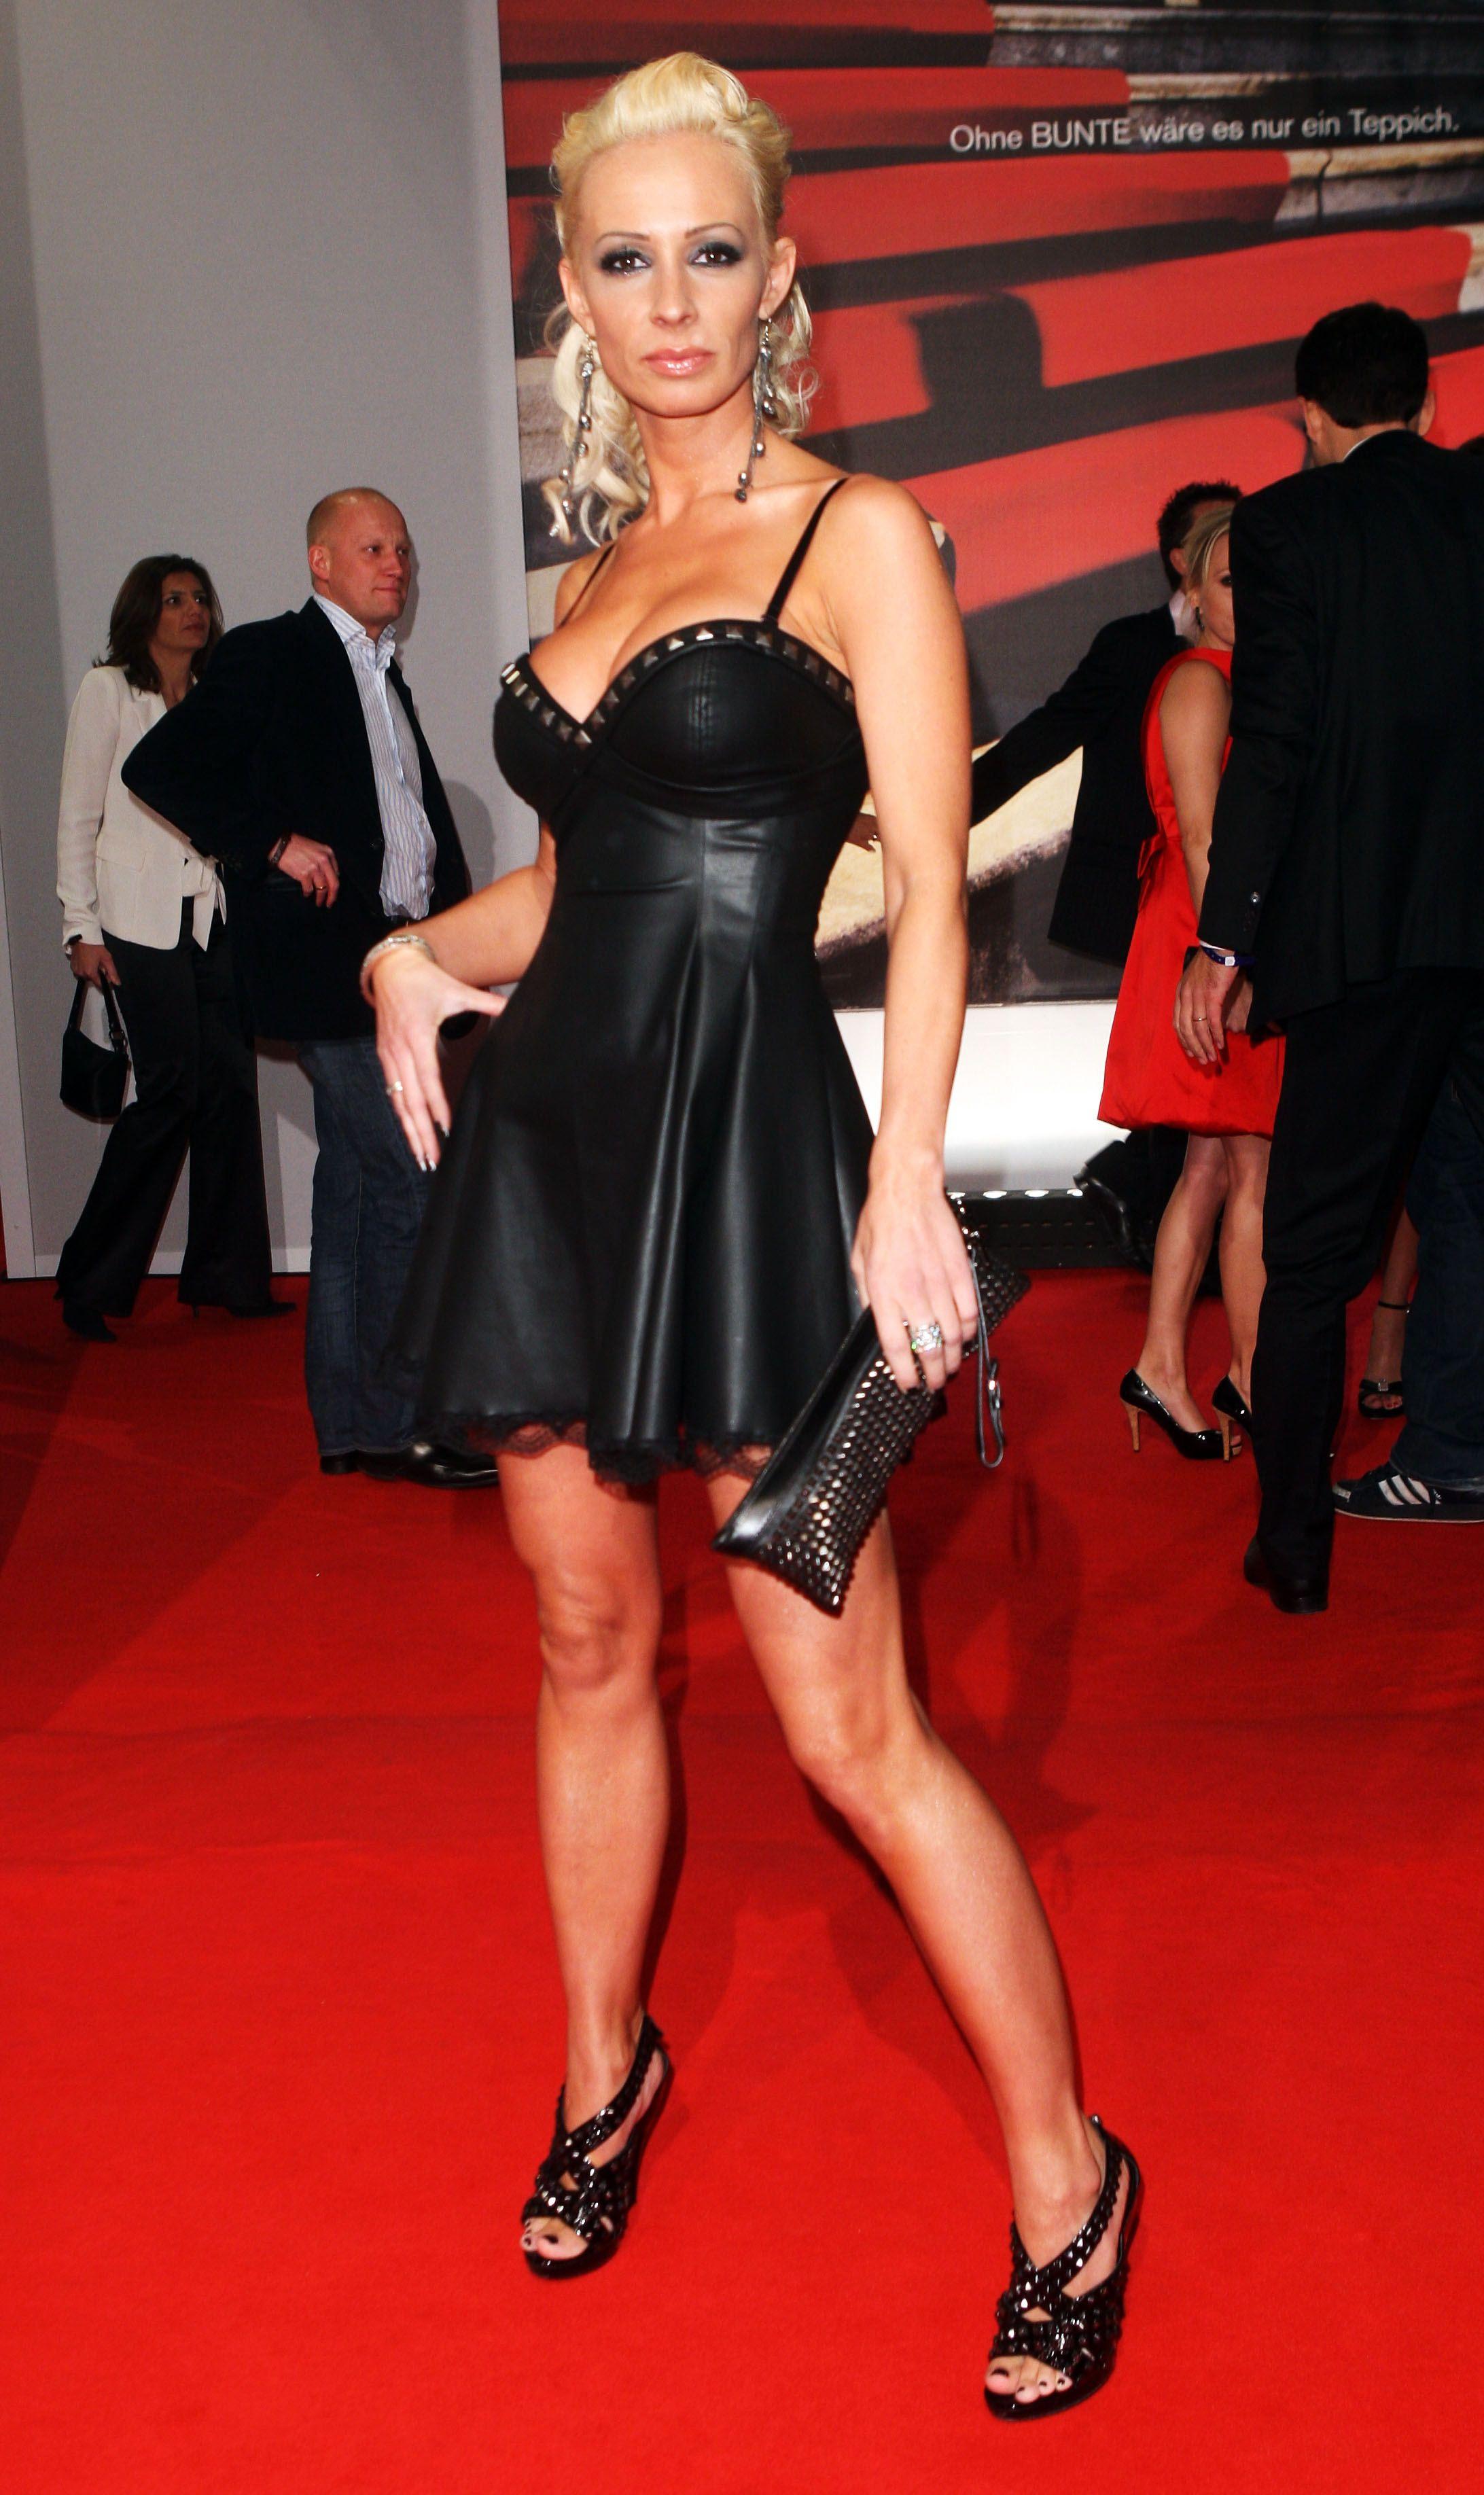 Hot Cora Schumacher nude (96 photos), Tits, Bikini, Selfie, braless 2015